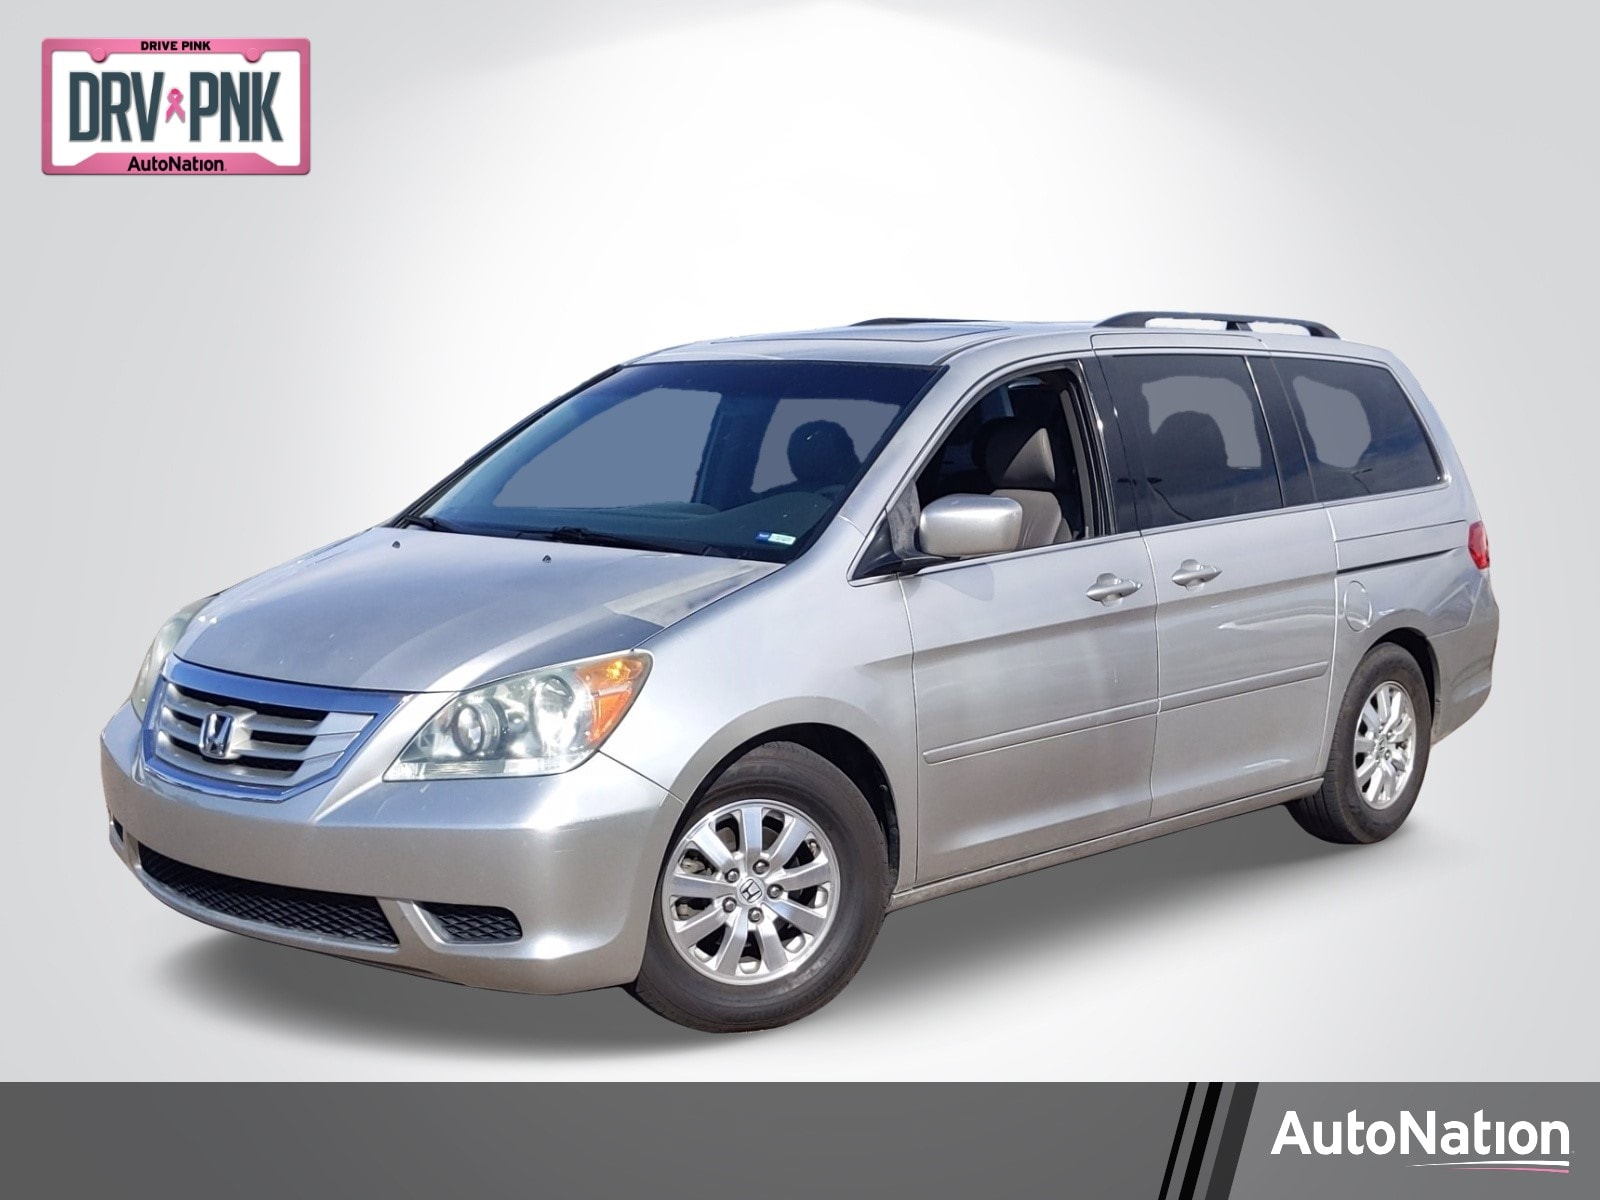 Used 2009 Honda Odyssey For Sale In Phoenix 9b037429 Autonation Usa